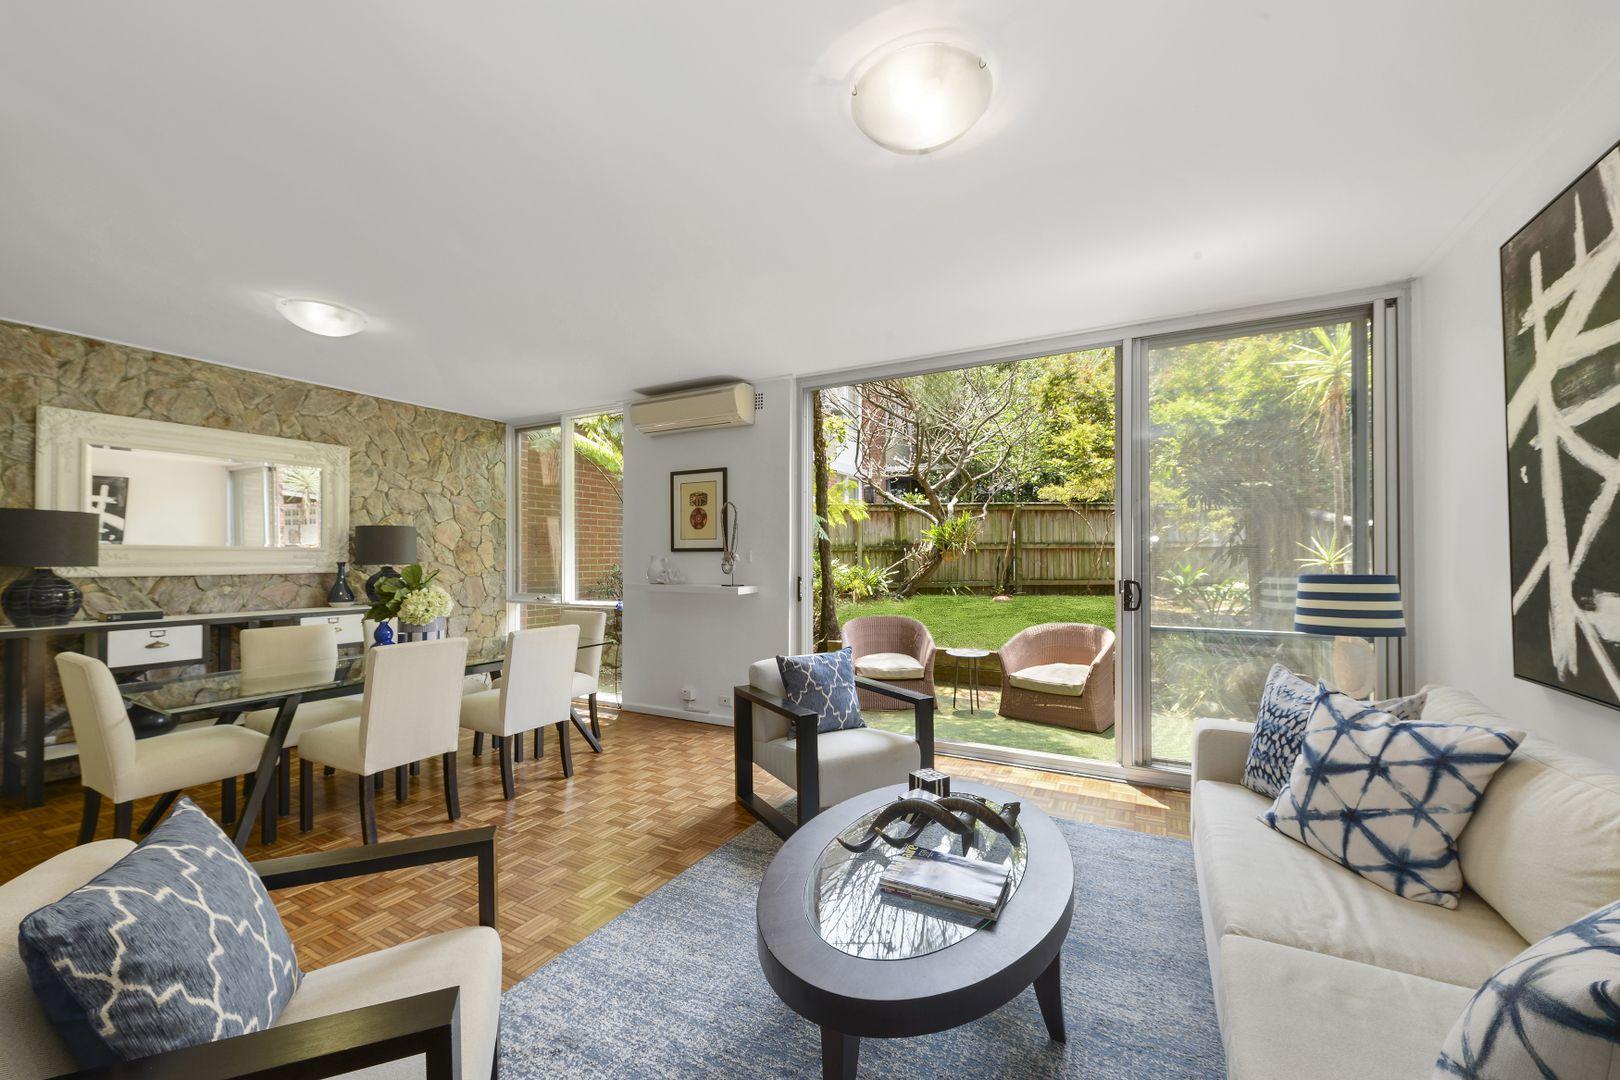 12/62 Ocean Street, Woollahra NSW 2025, Image 0